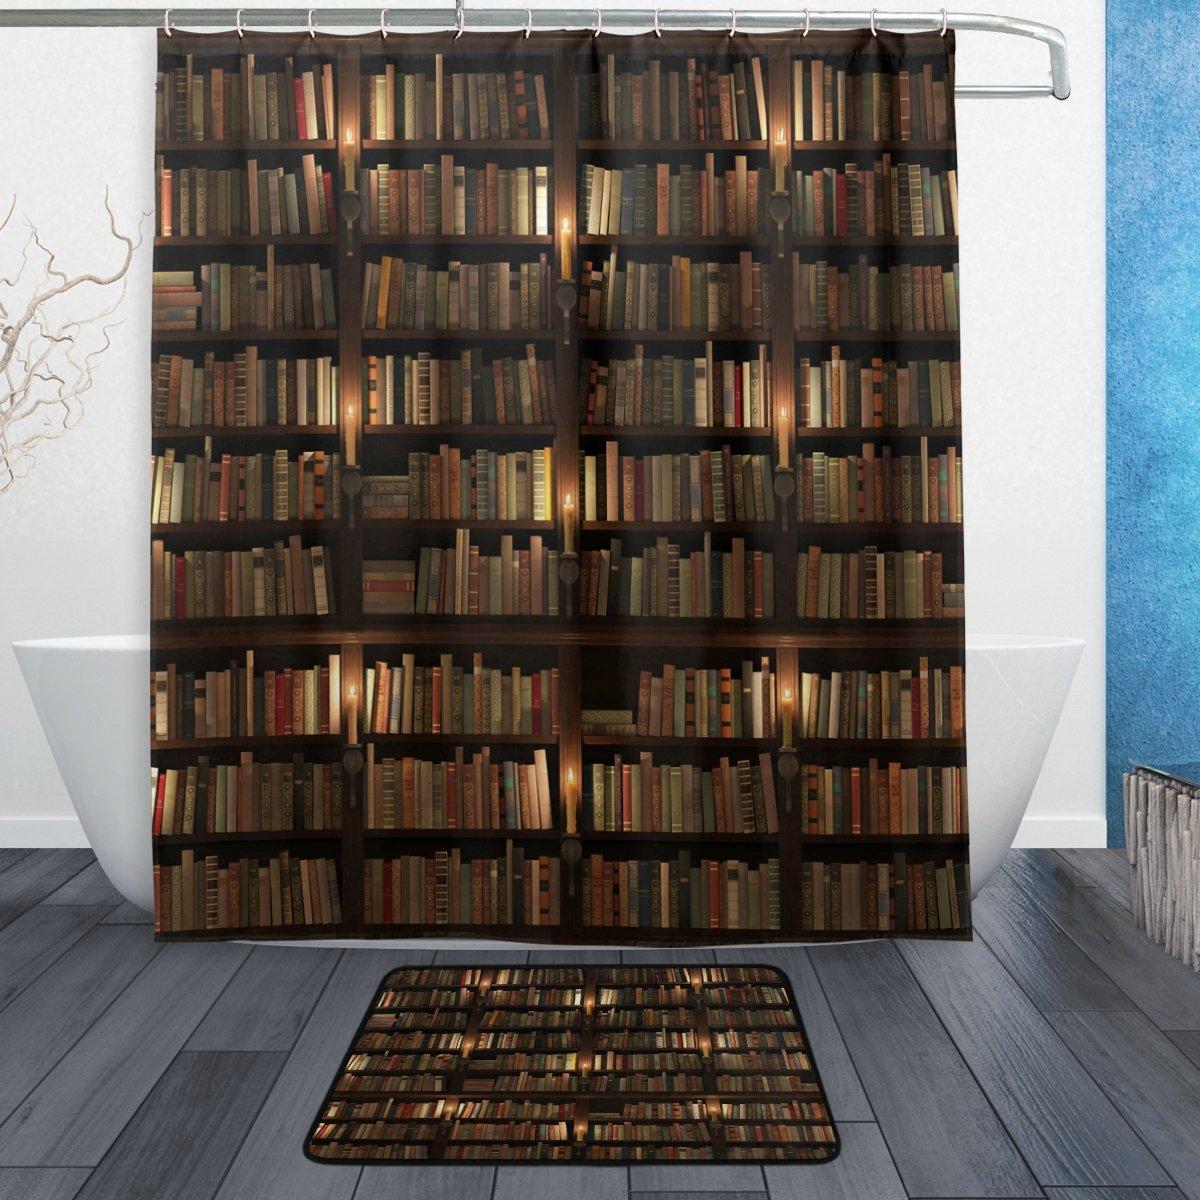 WOZO Library Bookworm Bookshelf Polyester Fabric Bathroom Shower Curtain 60 x 72 inch with Hooks Modern Bathroom Doormat Rug 23.6 x 15.7 inch